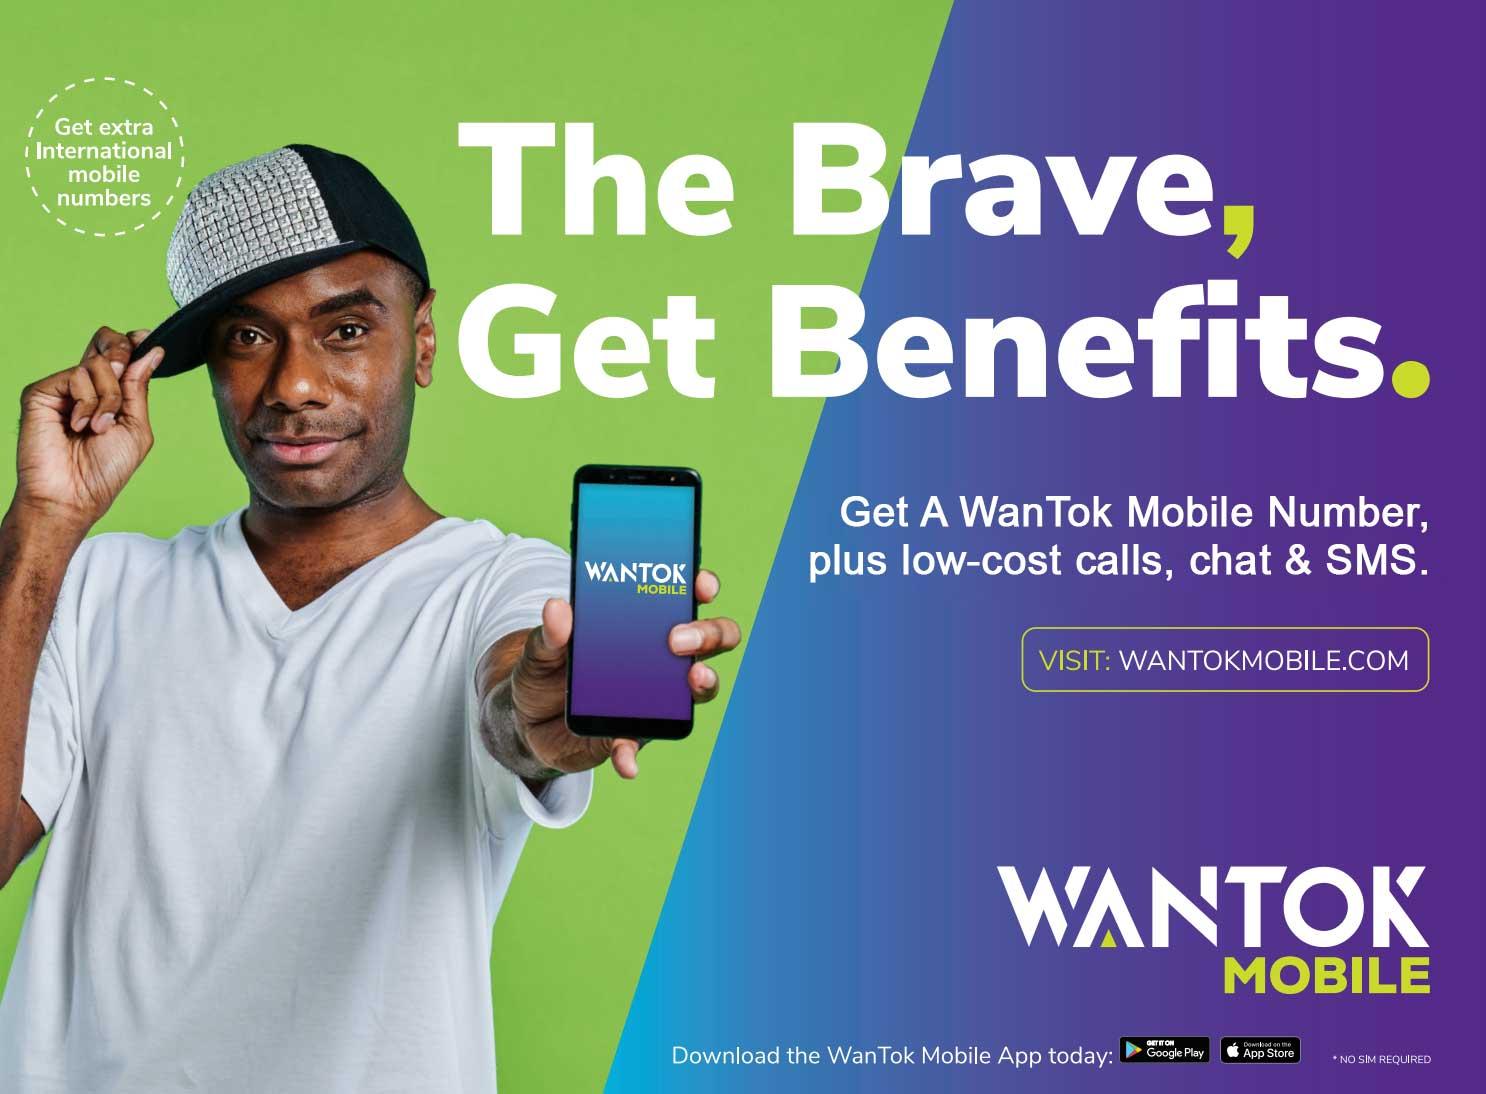 WanTok Mobile Services